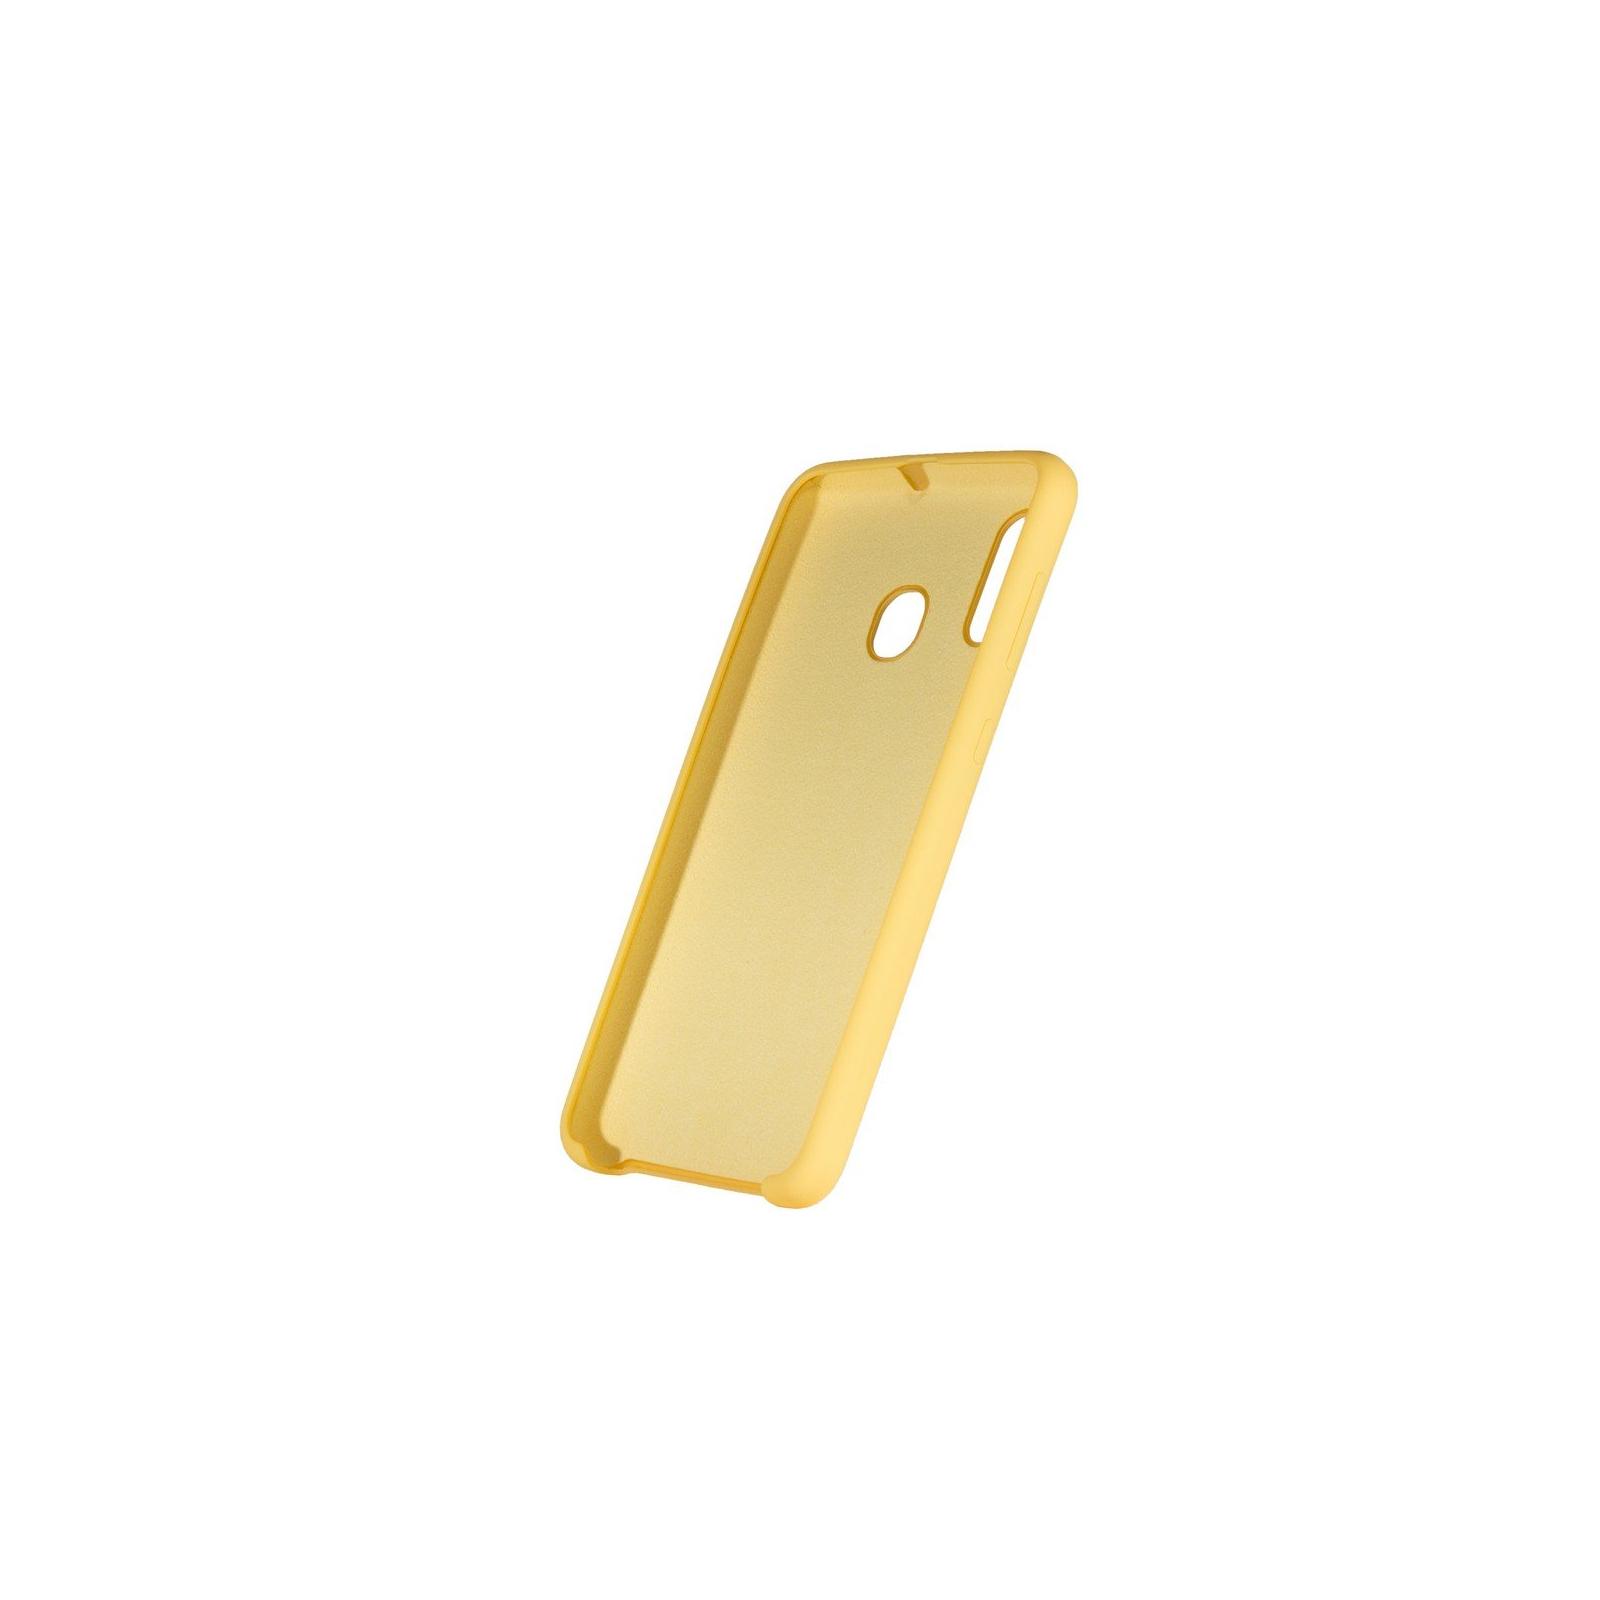 Чехол для моб. телефона ColorWay ColorWay Liquid Silicone для Samsung Galaxy A30 Red (CW-CLSSGA305-RD) изображение 4